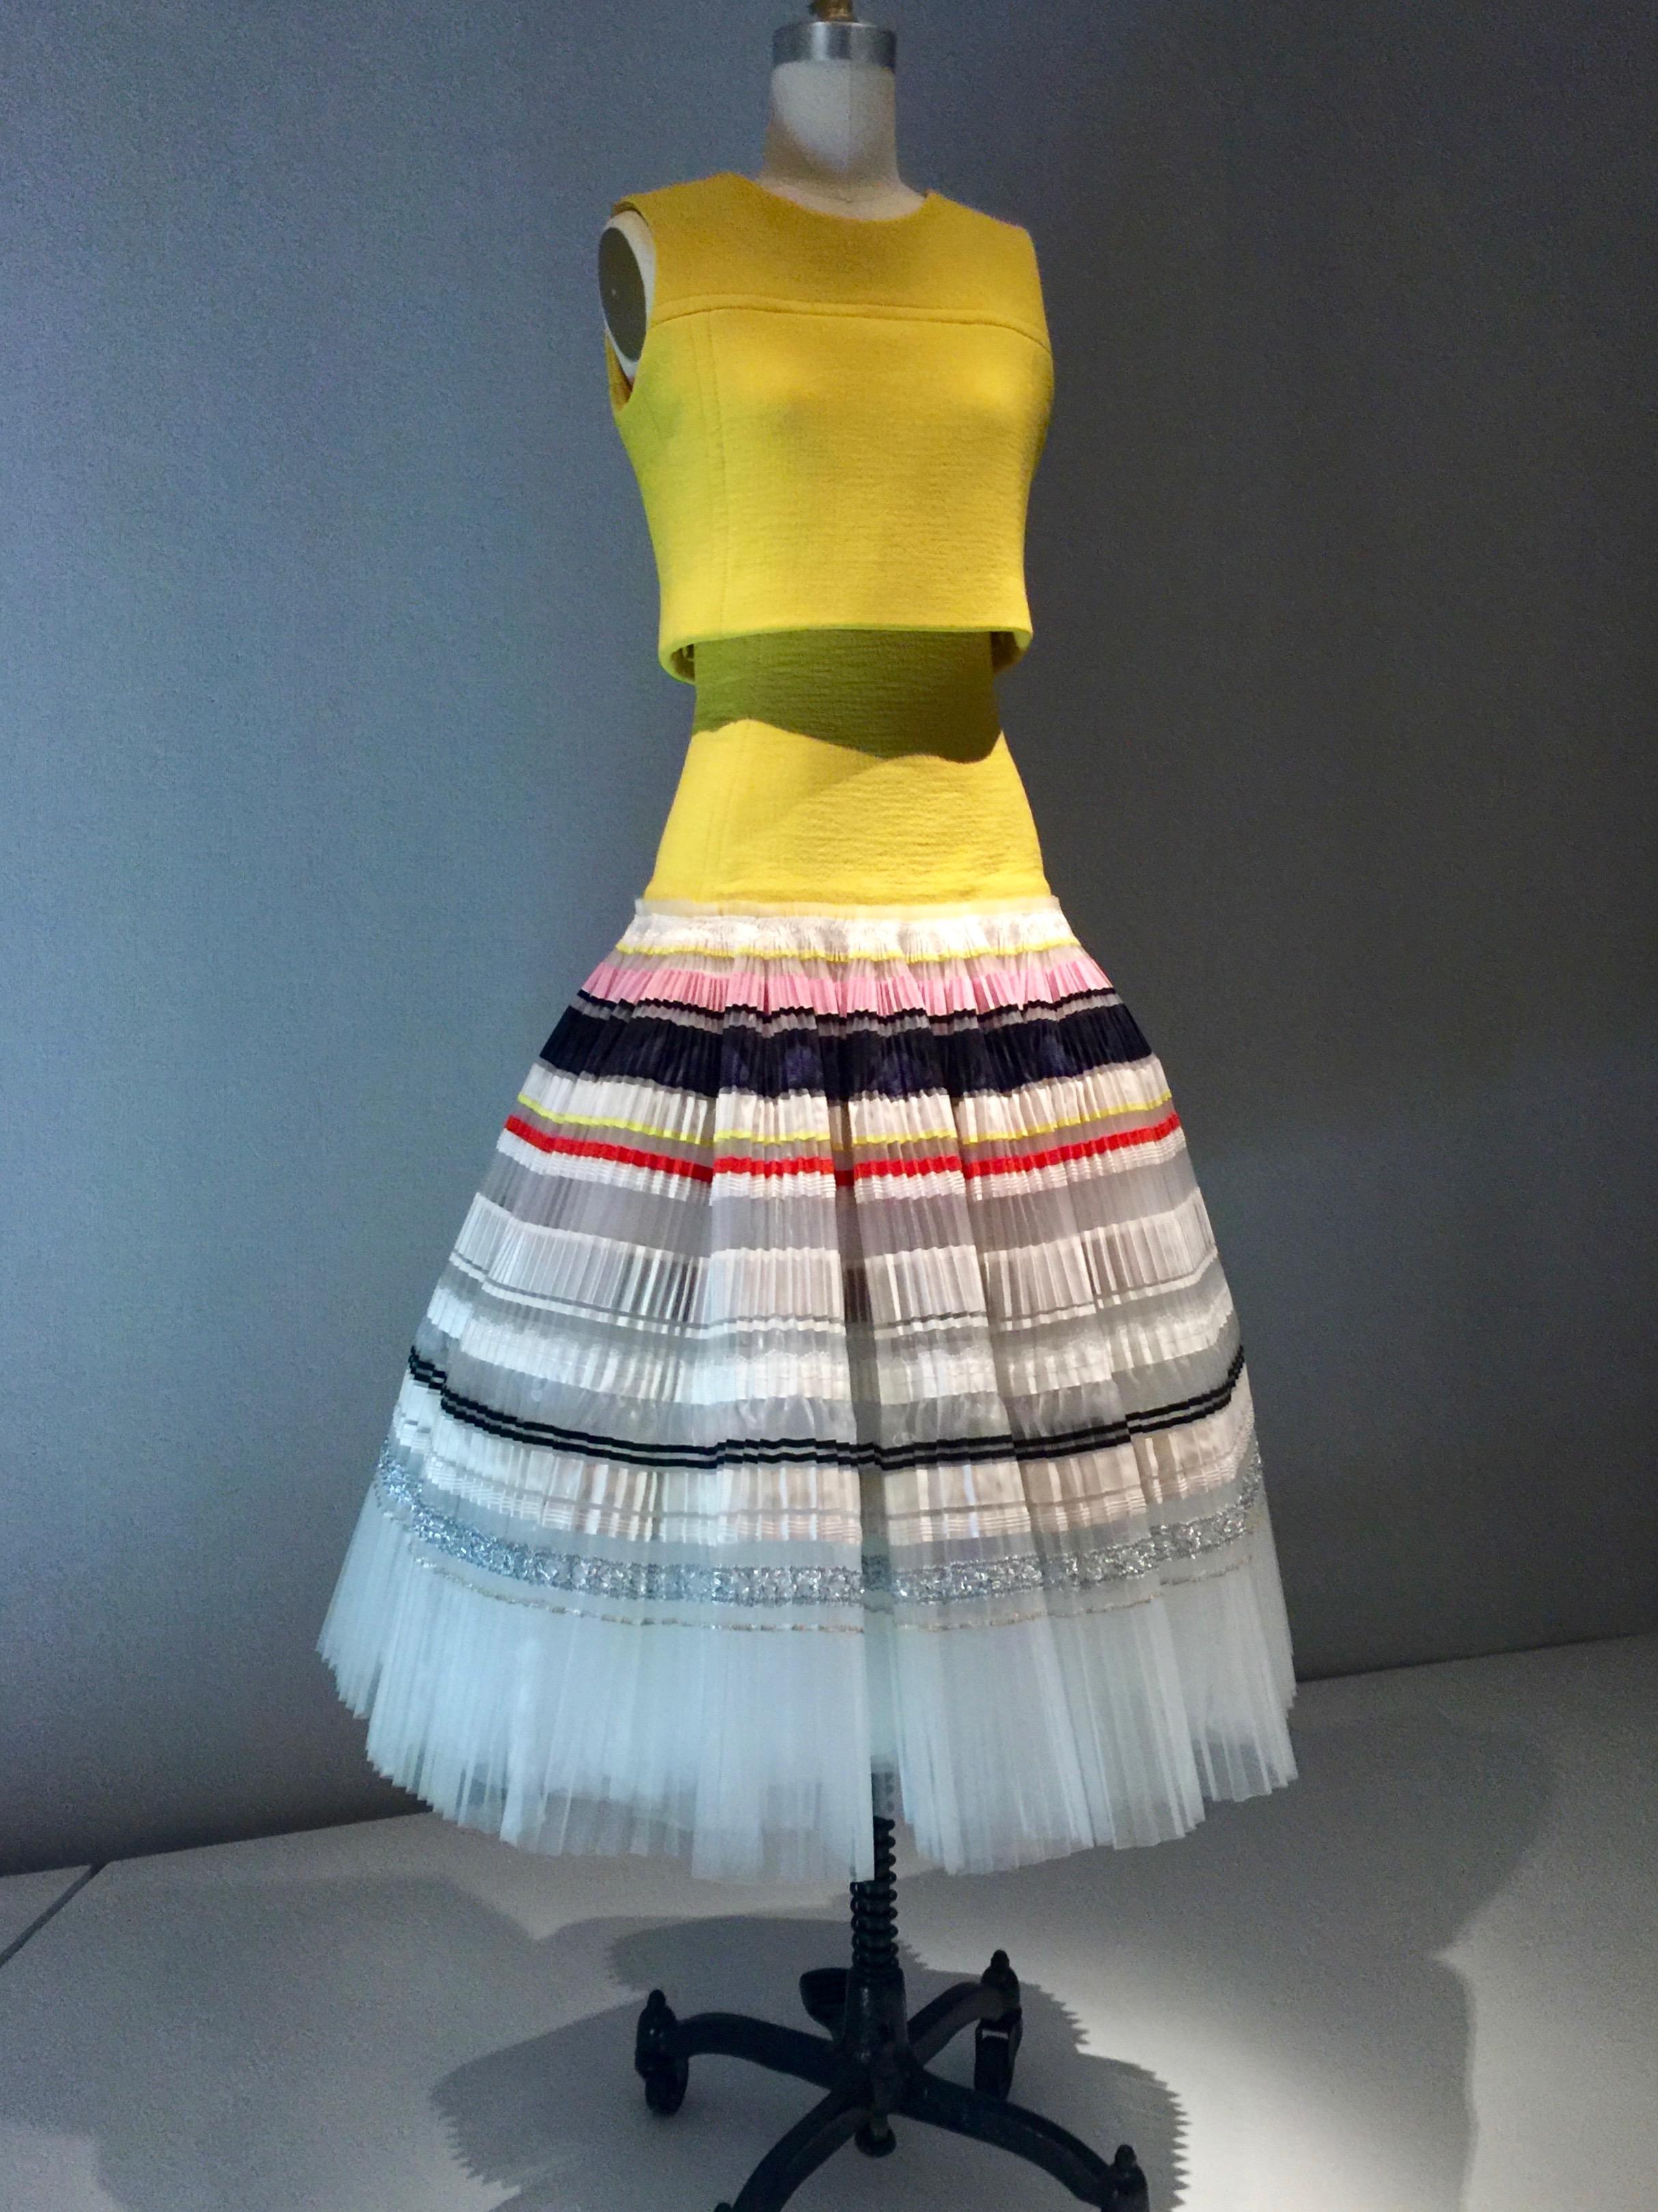 HOUSE OF DIOR, Raf Simons ENSEMBLE, Spring/Summer 2015, haute couture